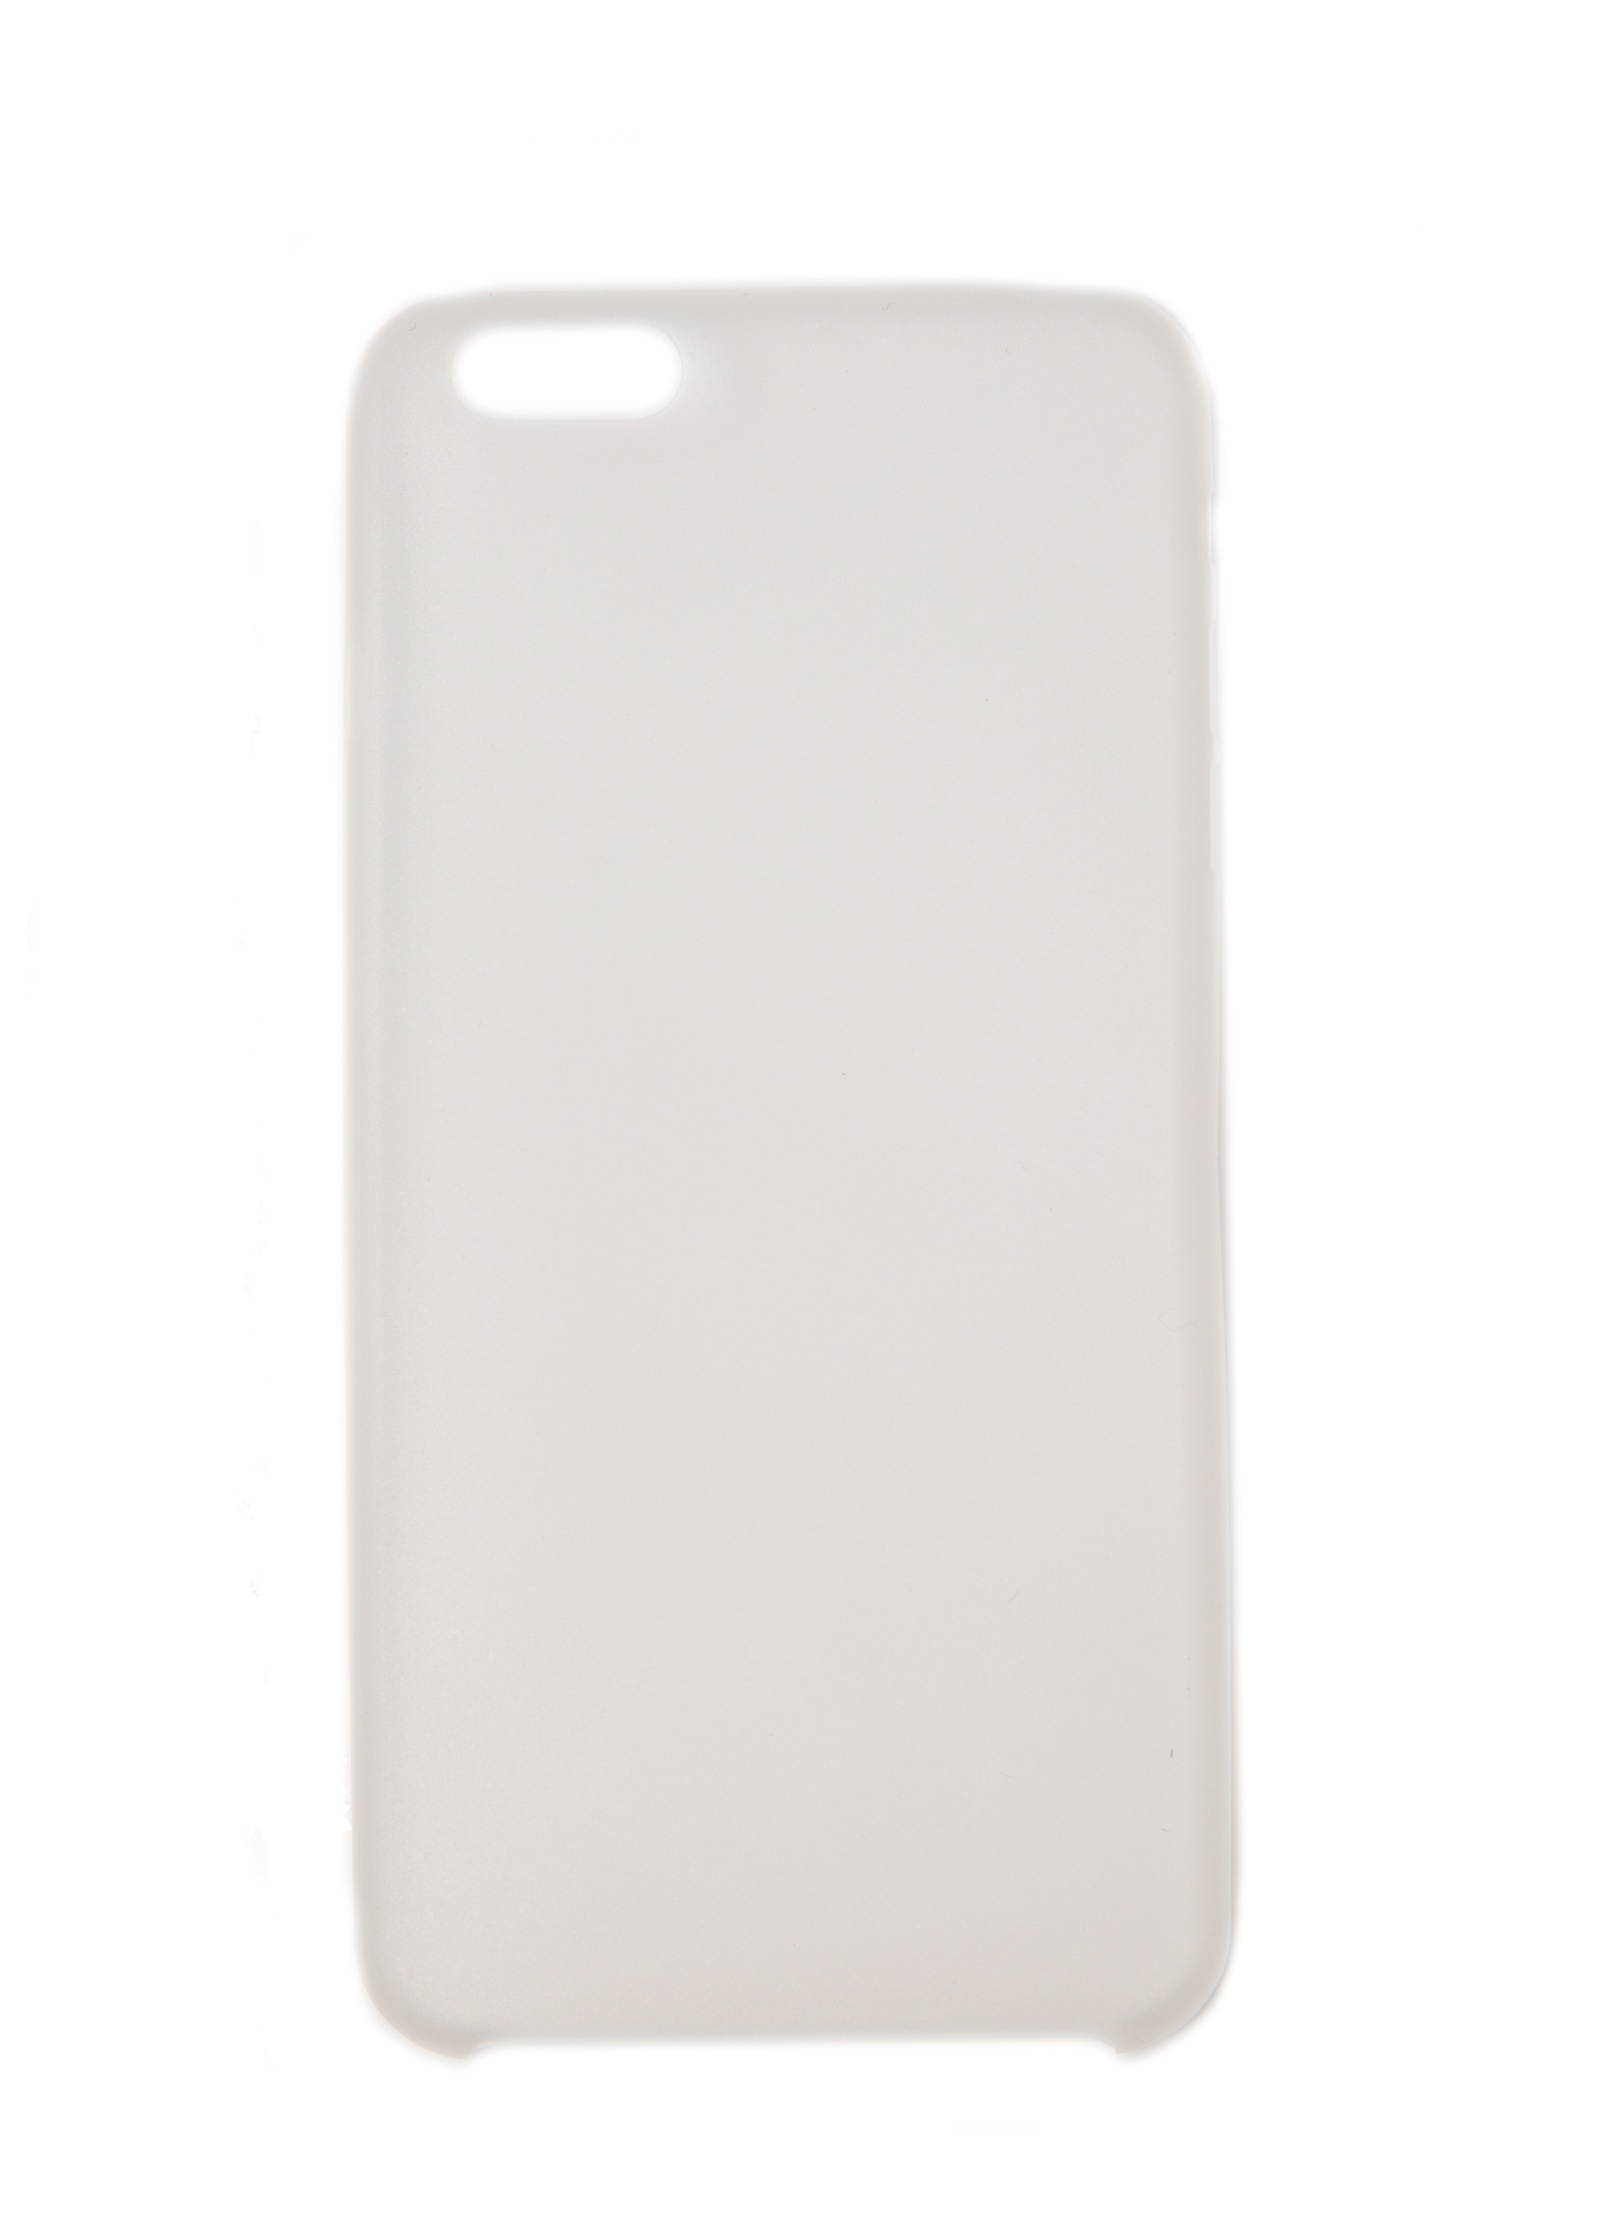 Чехол для сотового телефона Mitya Veselkov CASE, IP6.МITYA-235PVC все цены